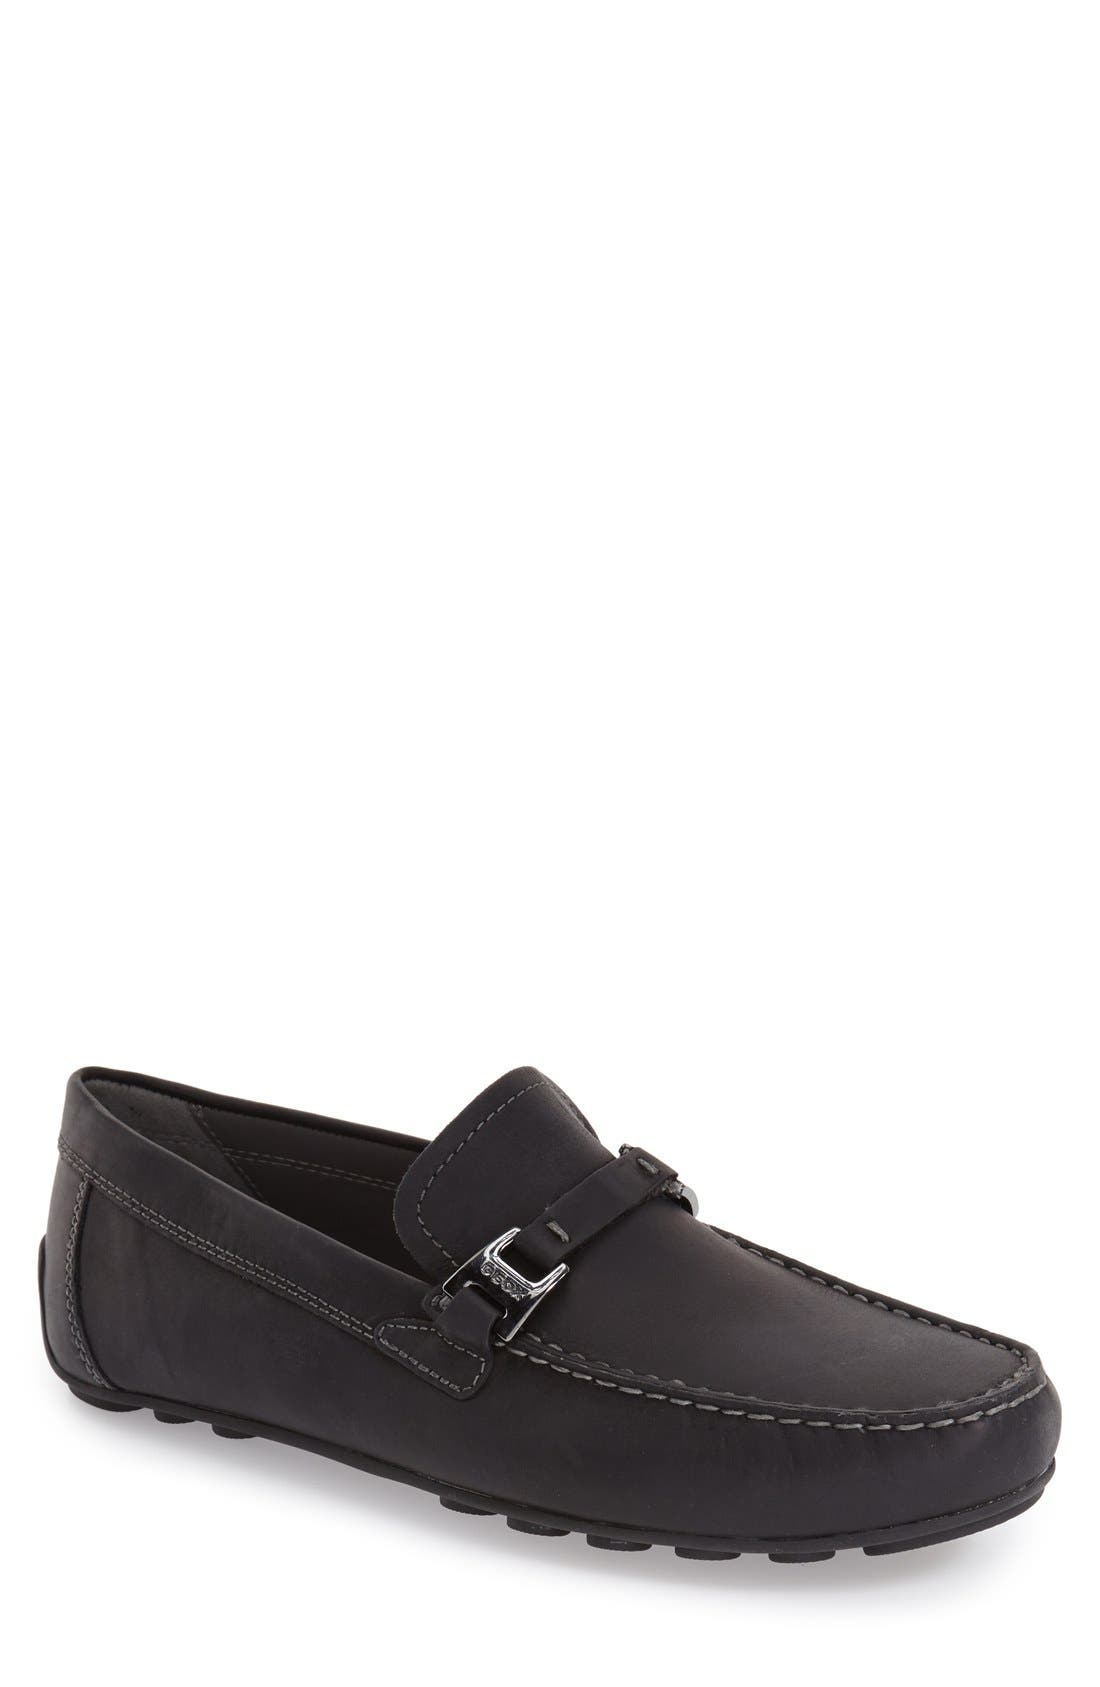 Geox 'Giona 1' Driving Shoe (Men)